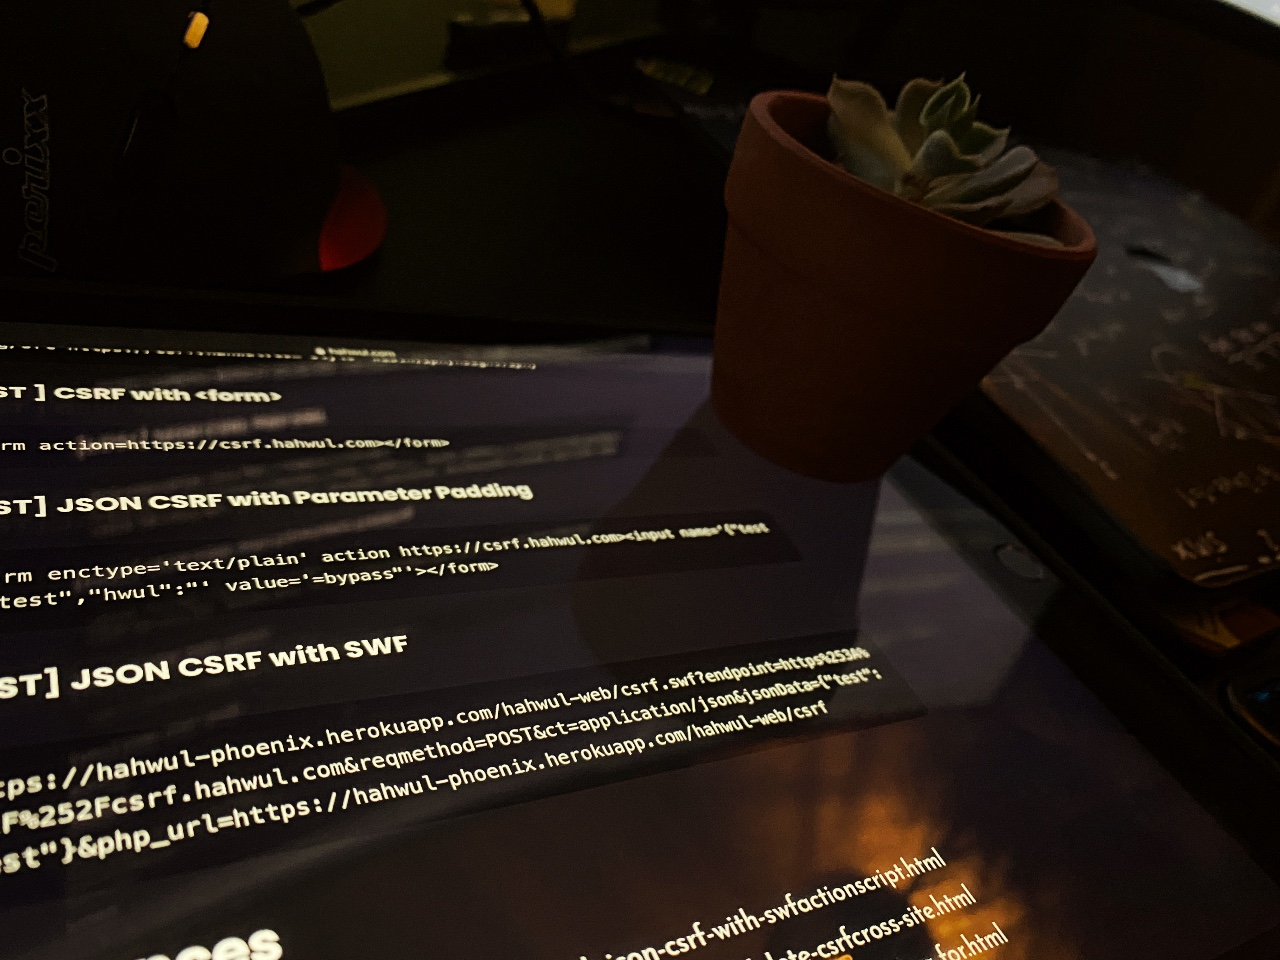 [Phoenix #5] Fixed bug in CSRF Payload Generator